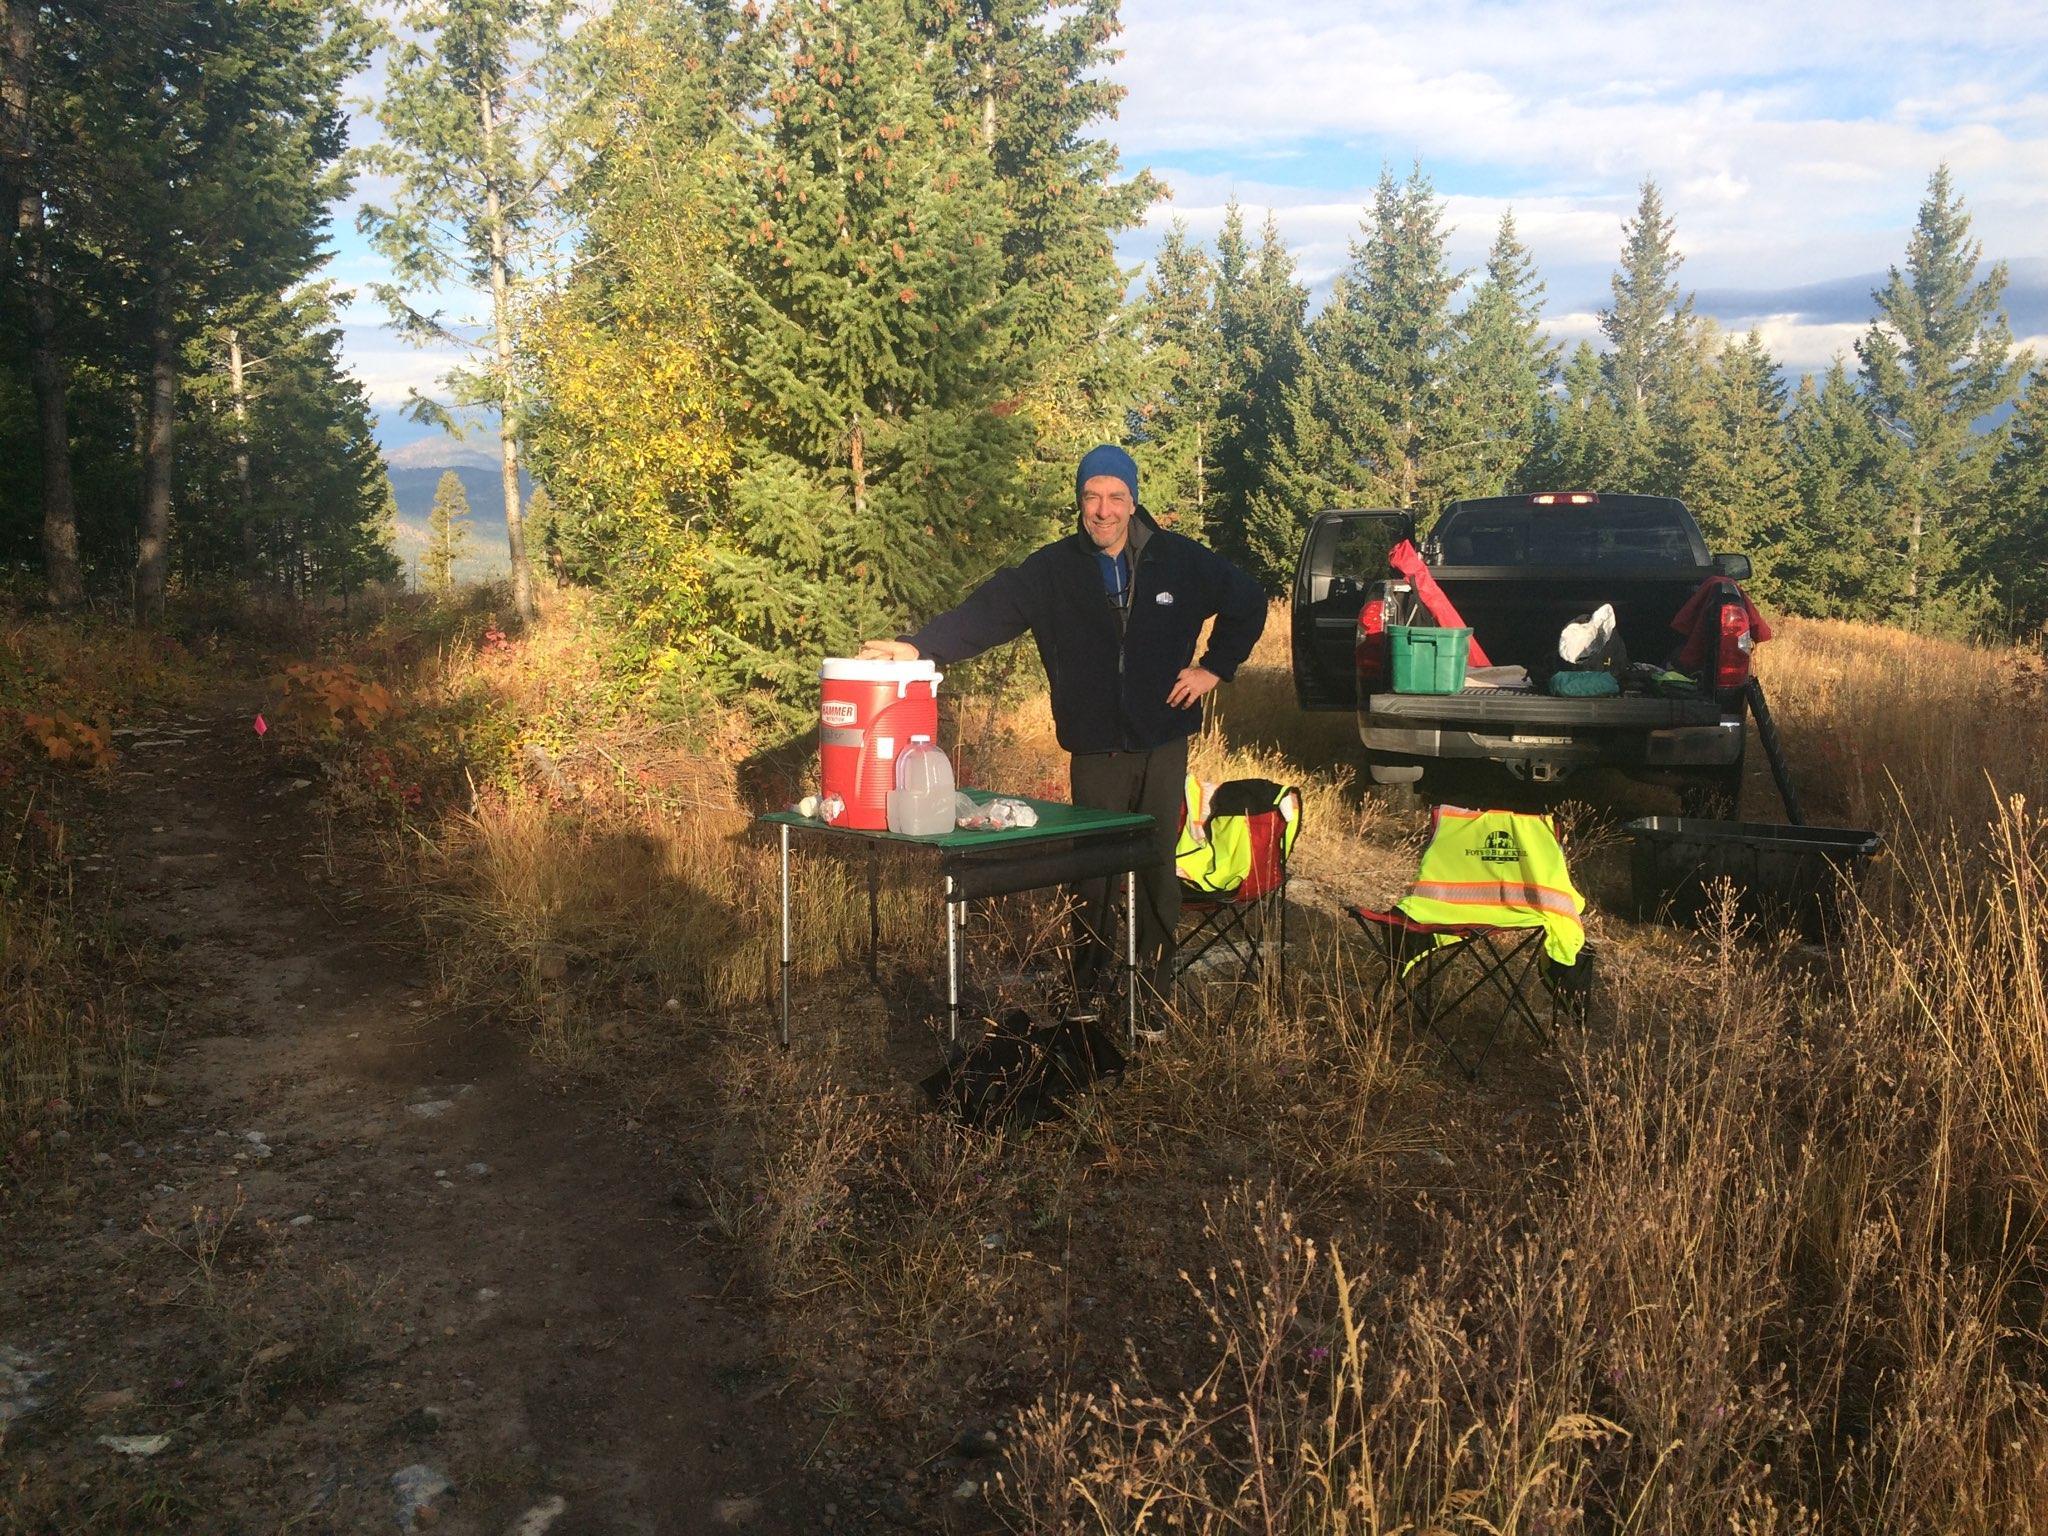 foys to blacktail trails trail marathon ftbtIMG_1768.JPG